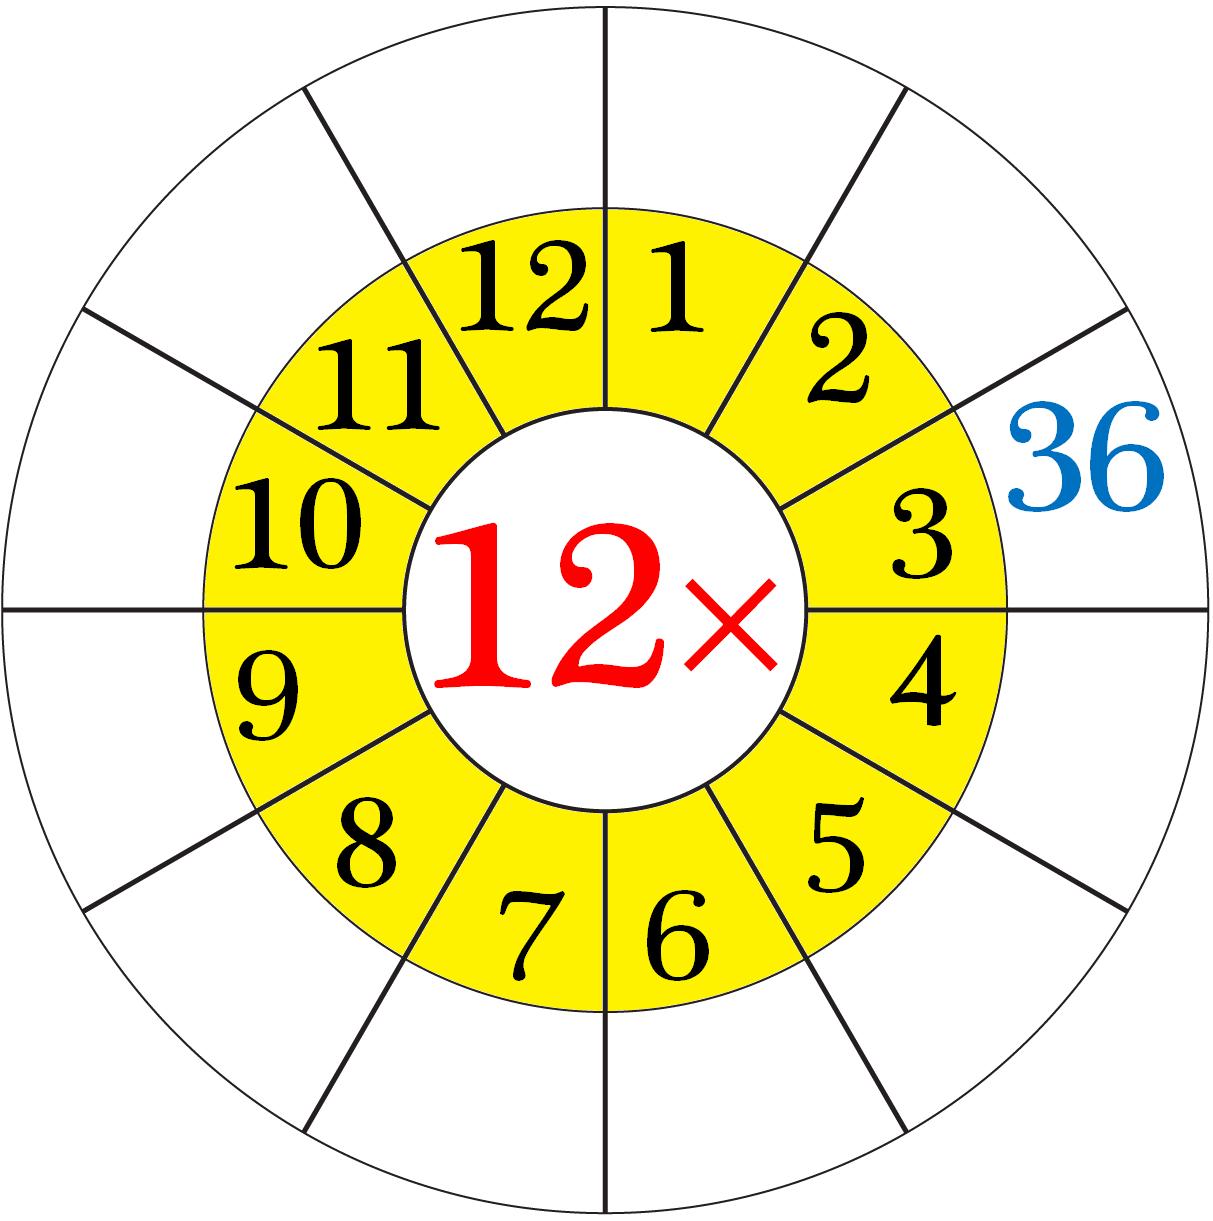 Worksheet on Multiplication Table of 12